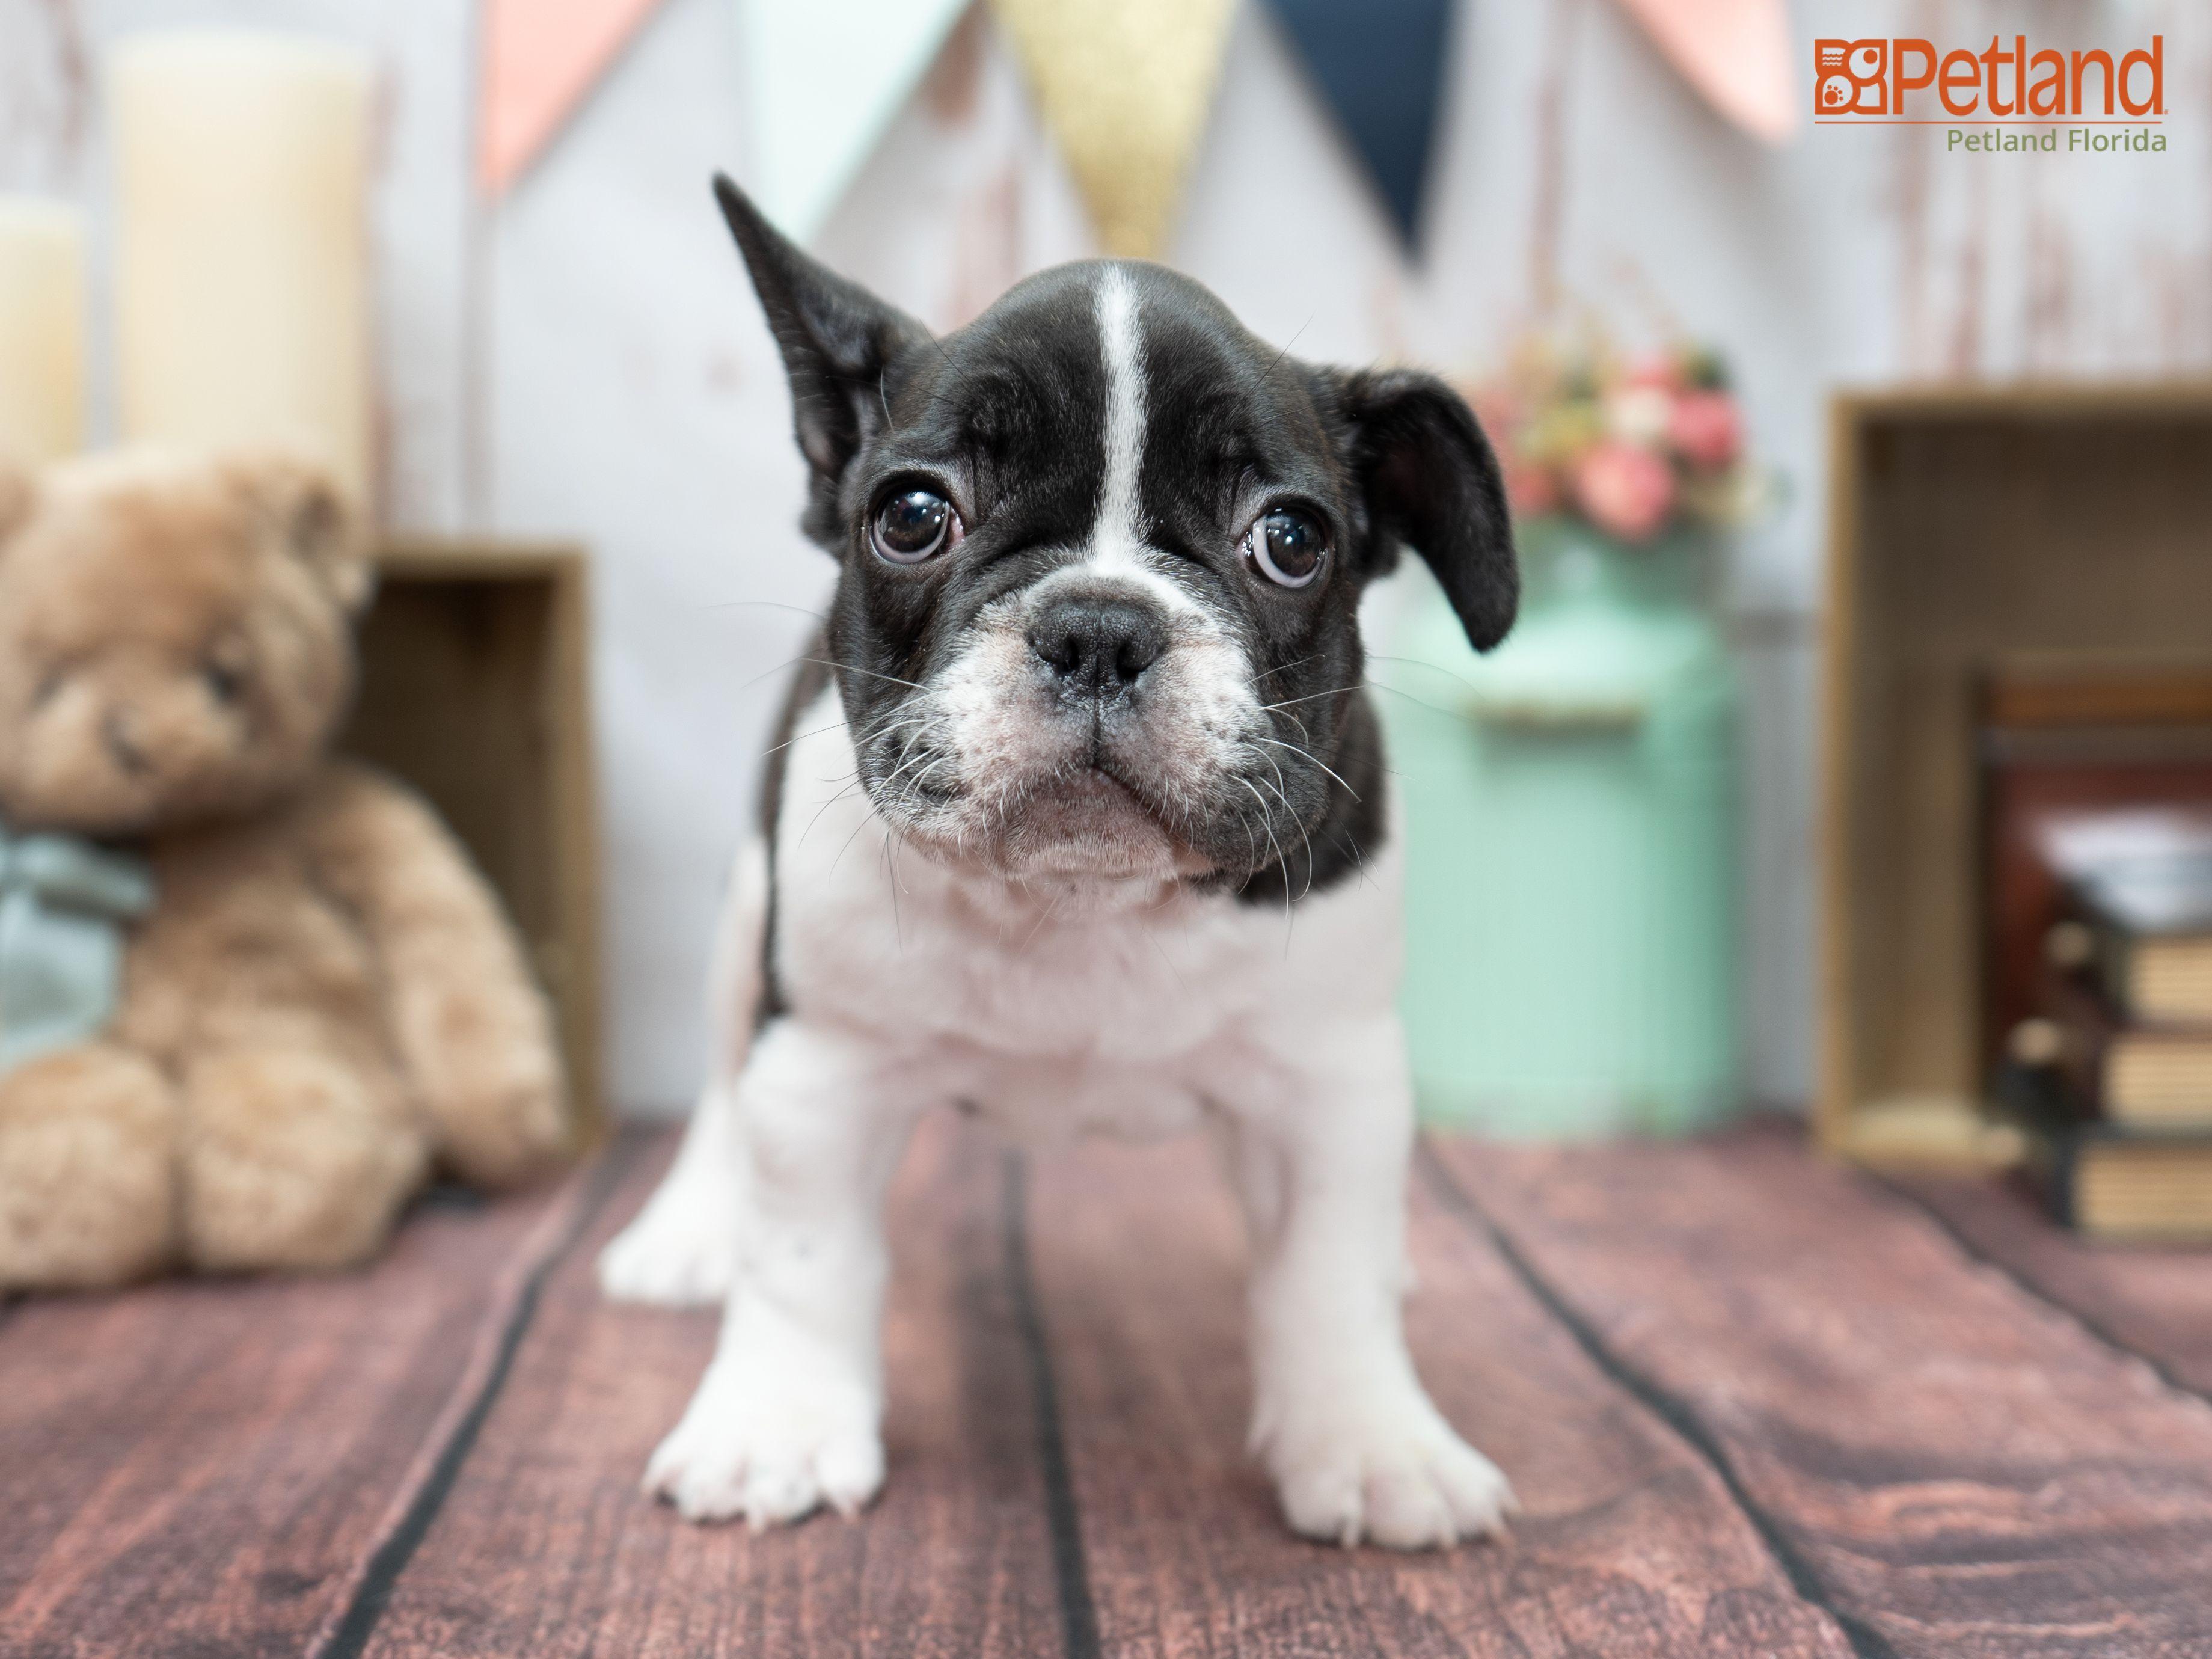 Petland Florida has French Bulldog puppies for sale! Check